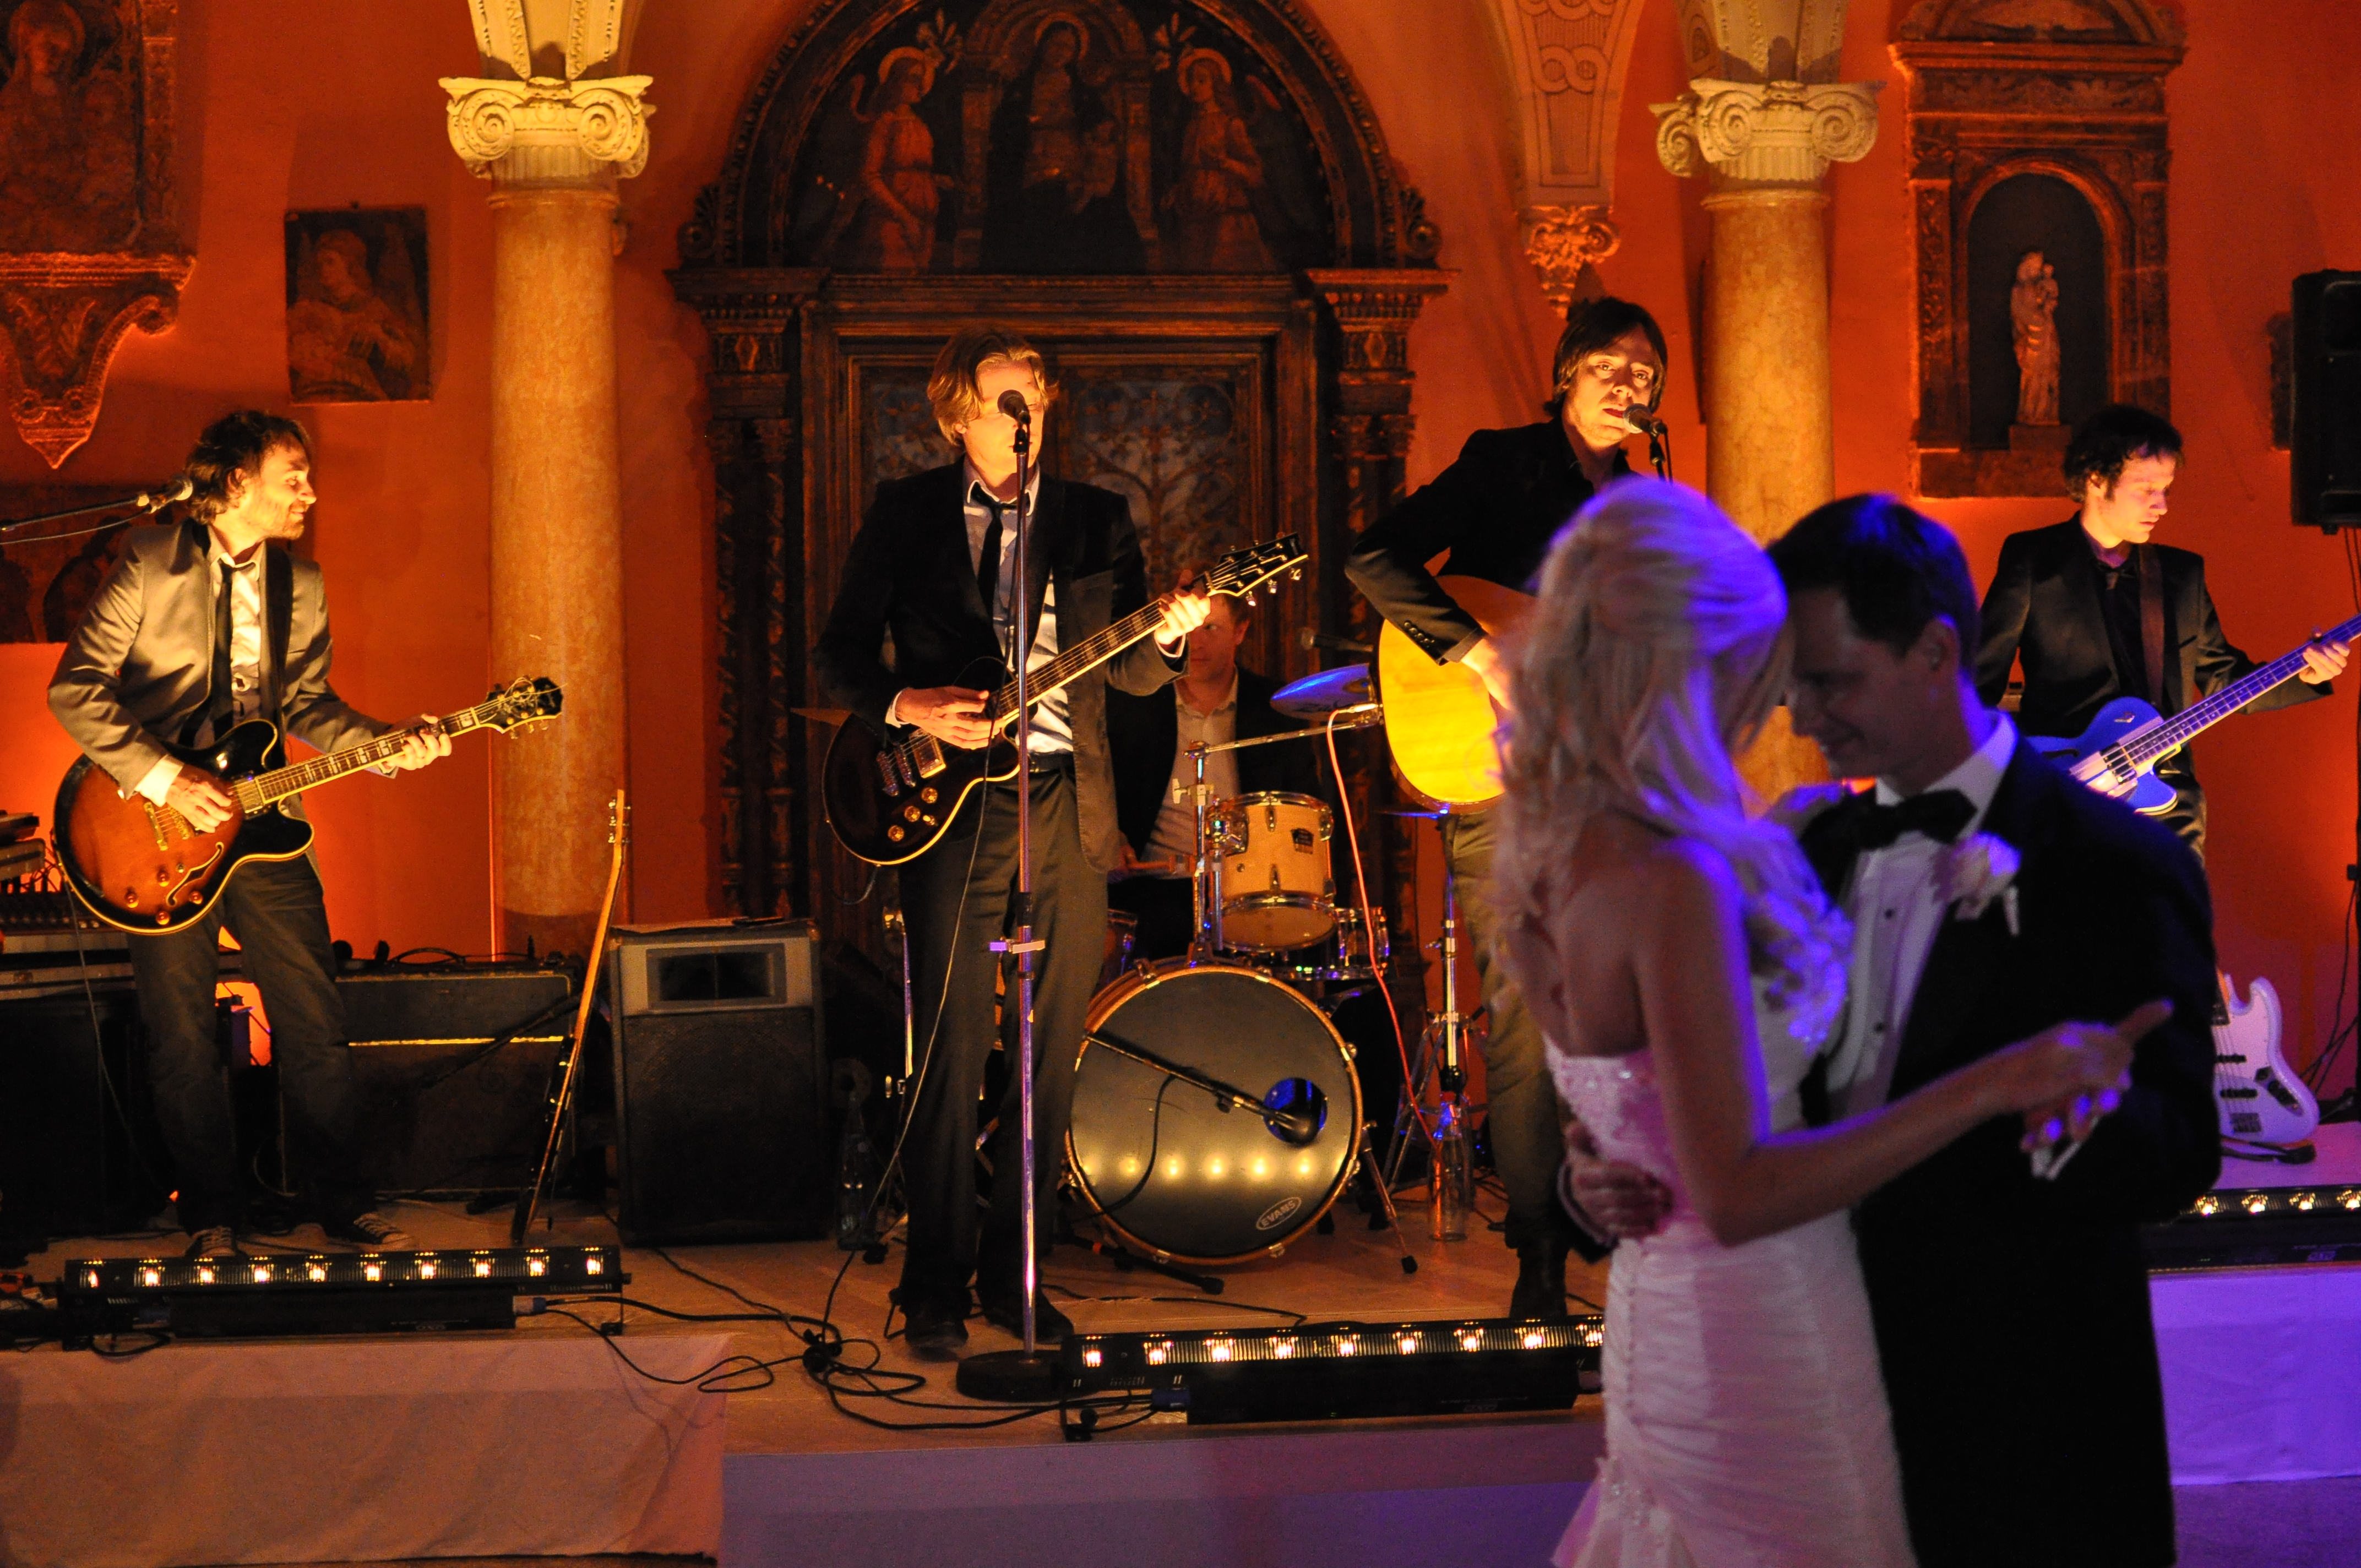 Wedding Dance Bands 15 Good french riviera wedding band